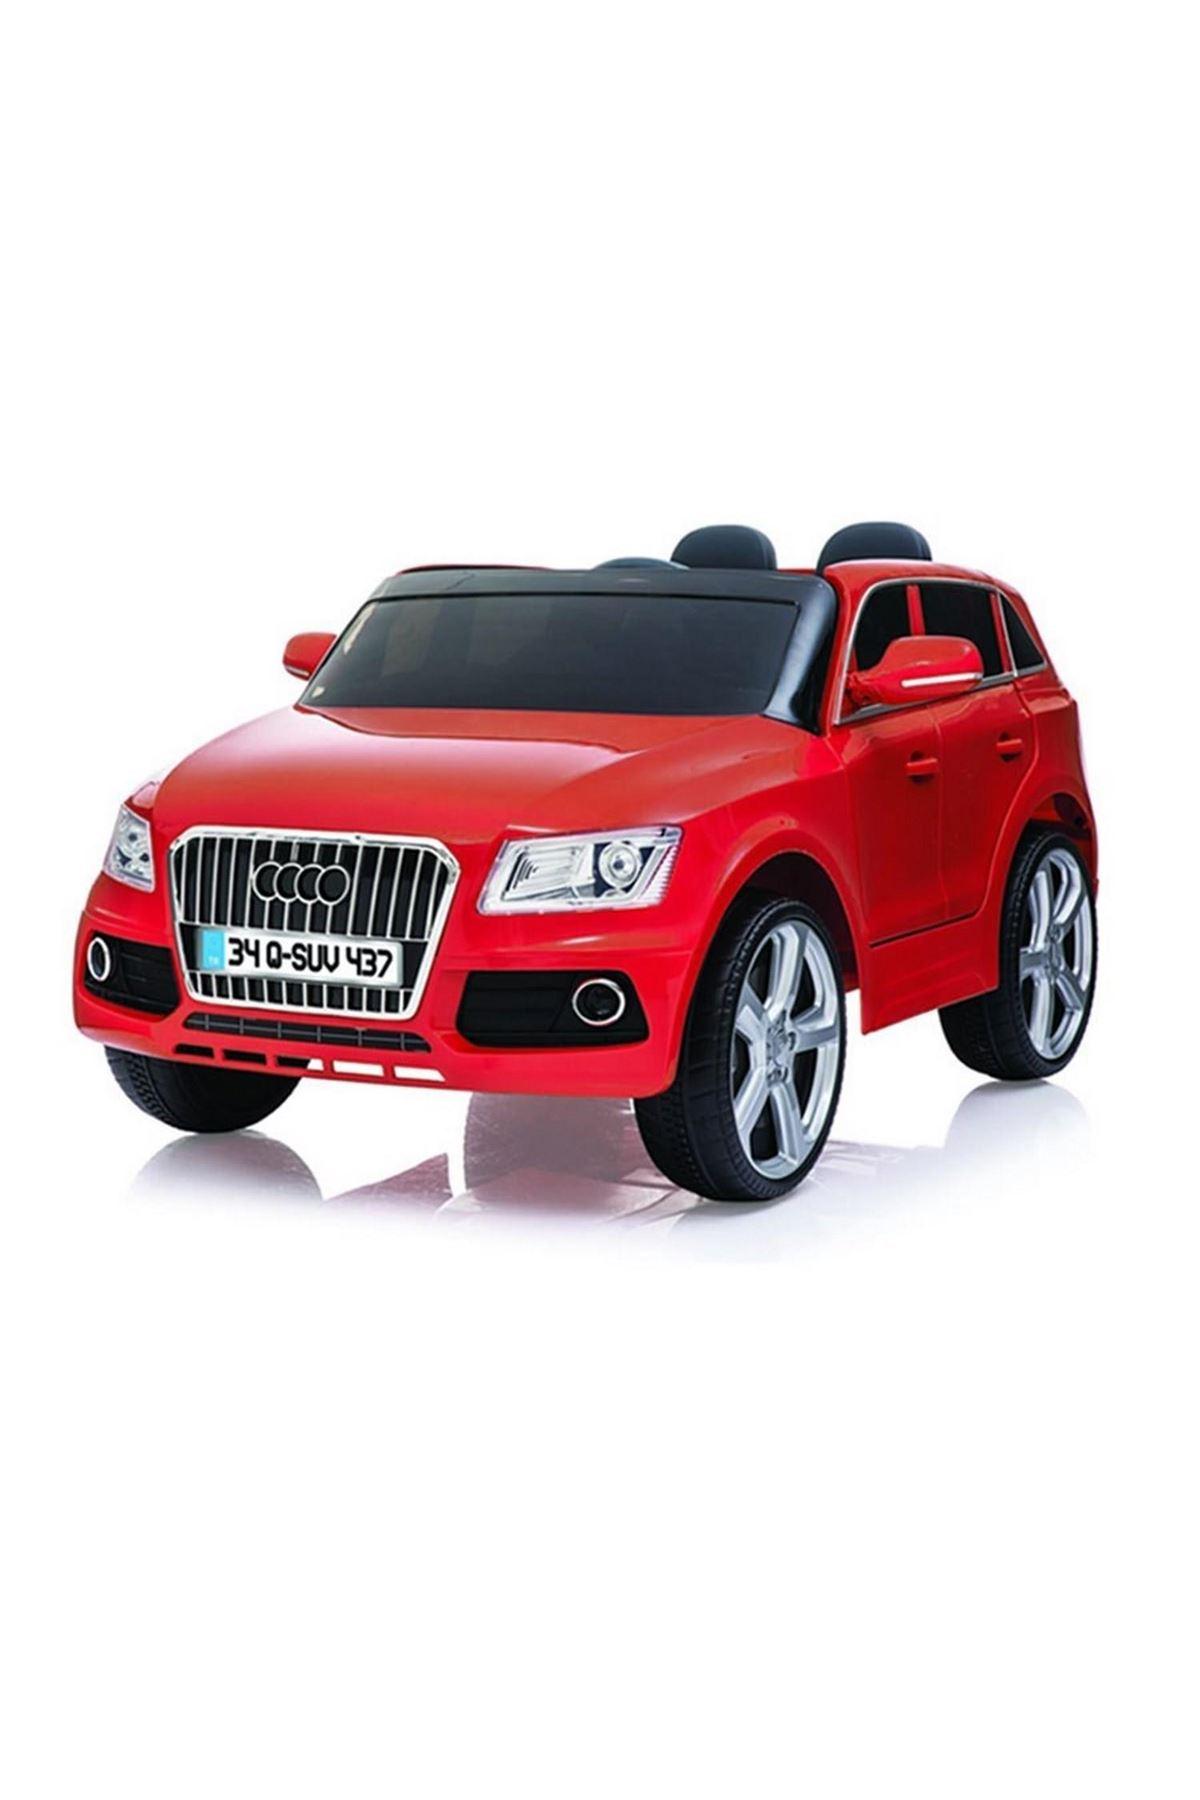 Babyhope Q-Suv Uzaktan Kumandalı Akülü Araba 12V 437 Kırmızı